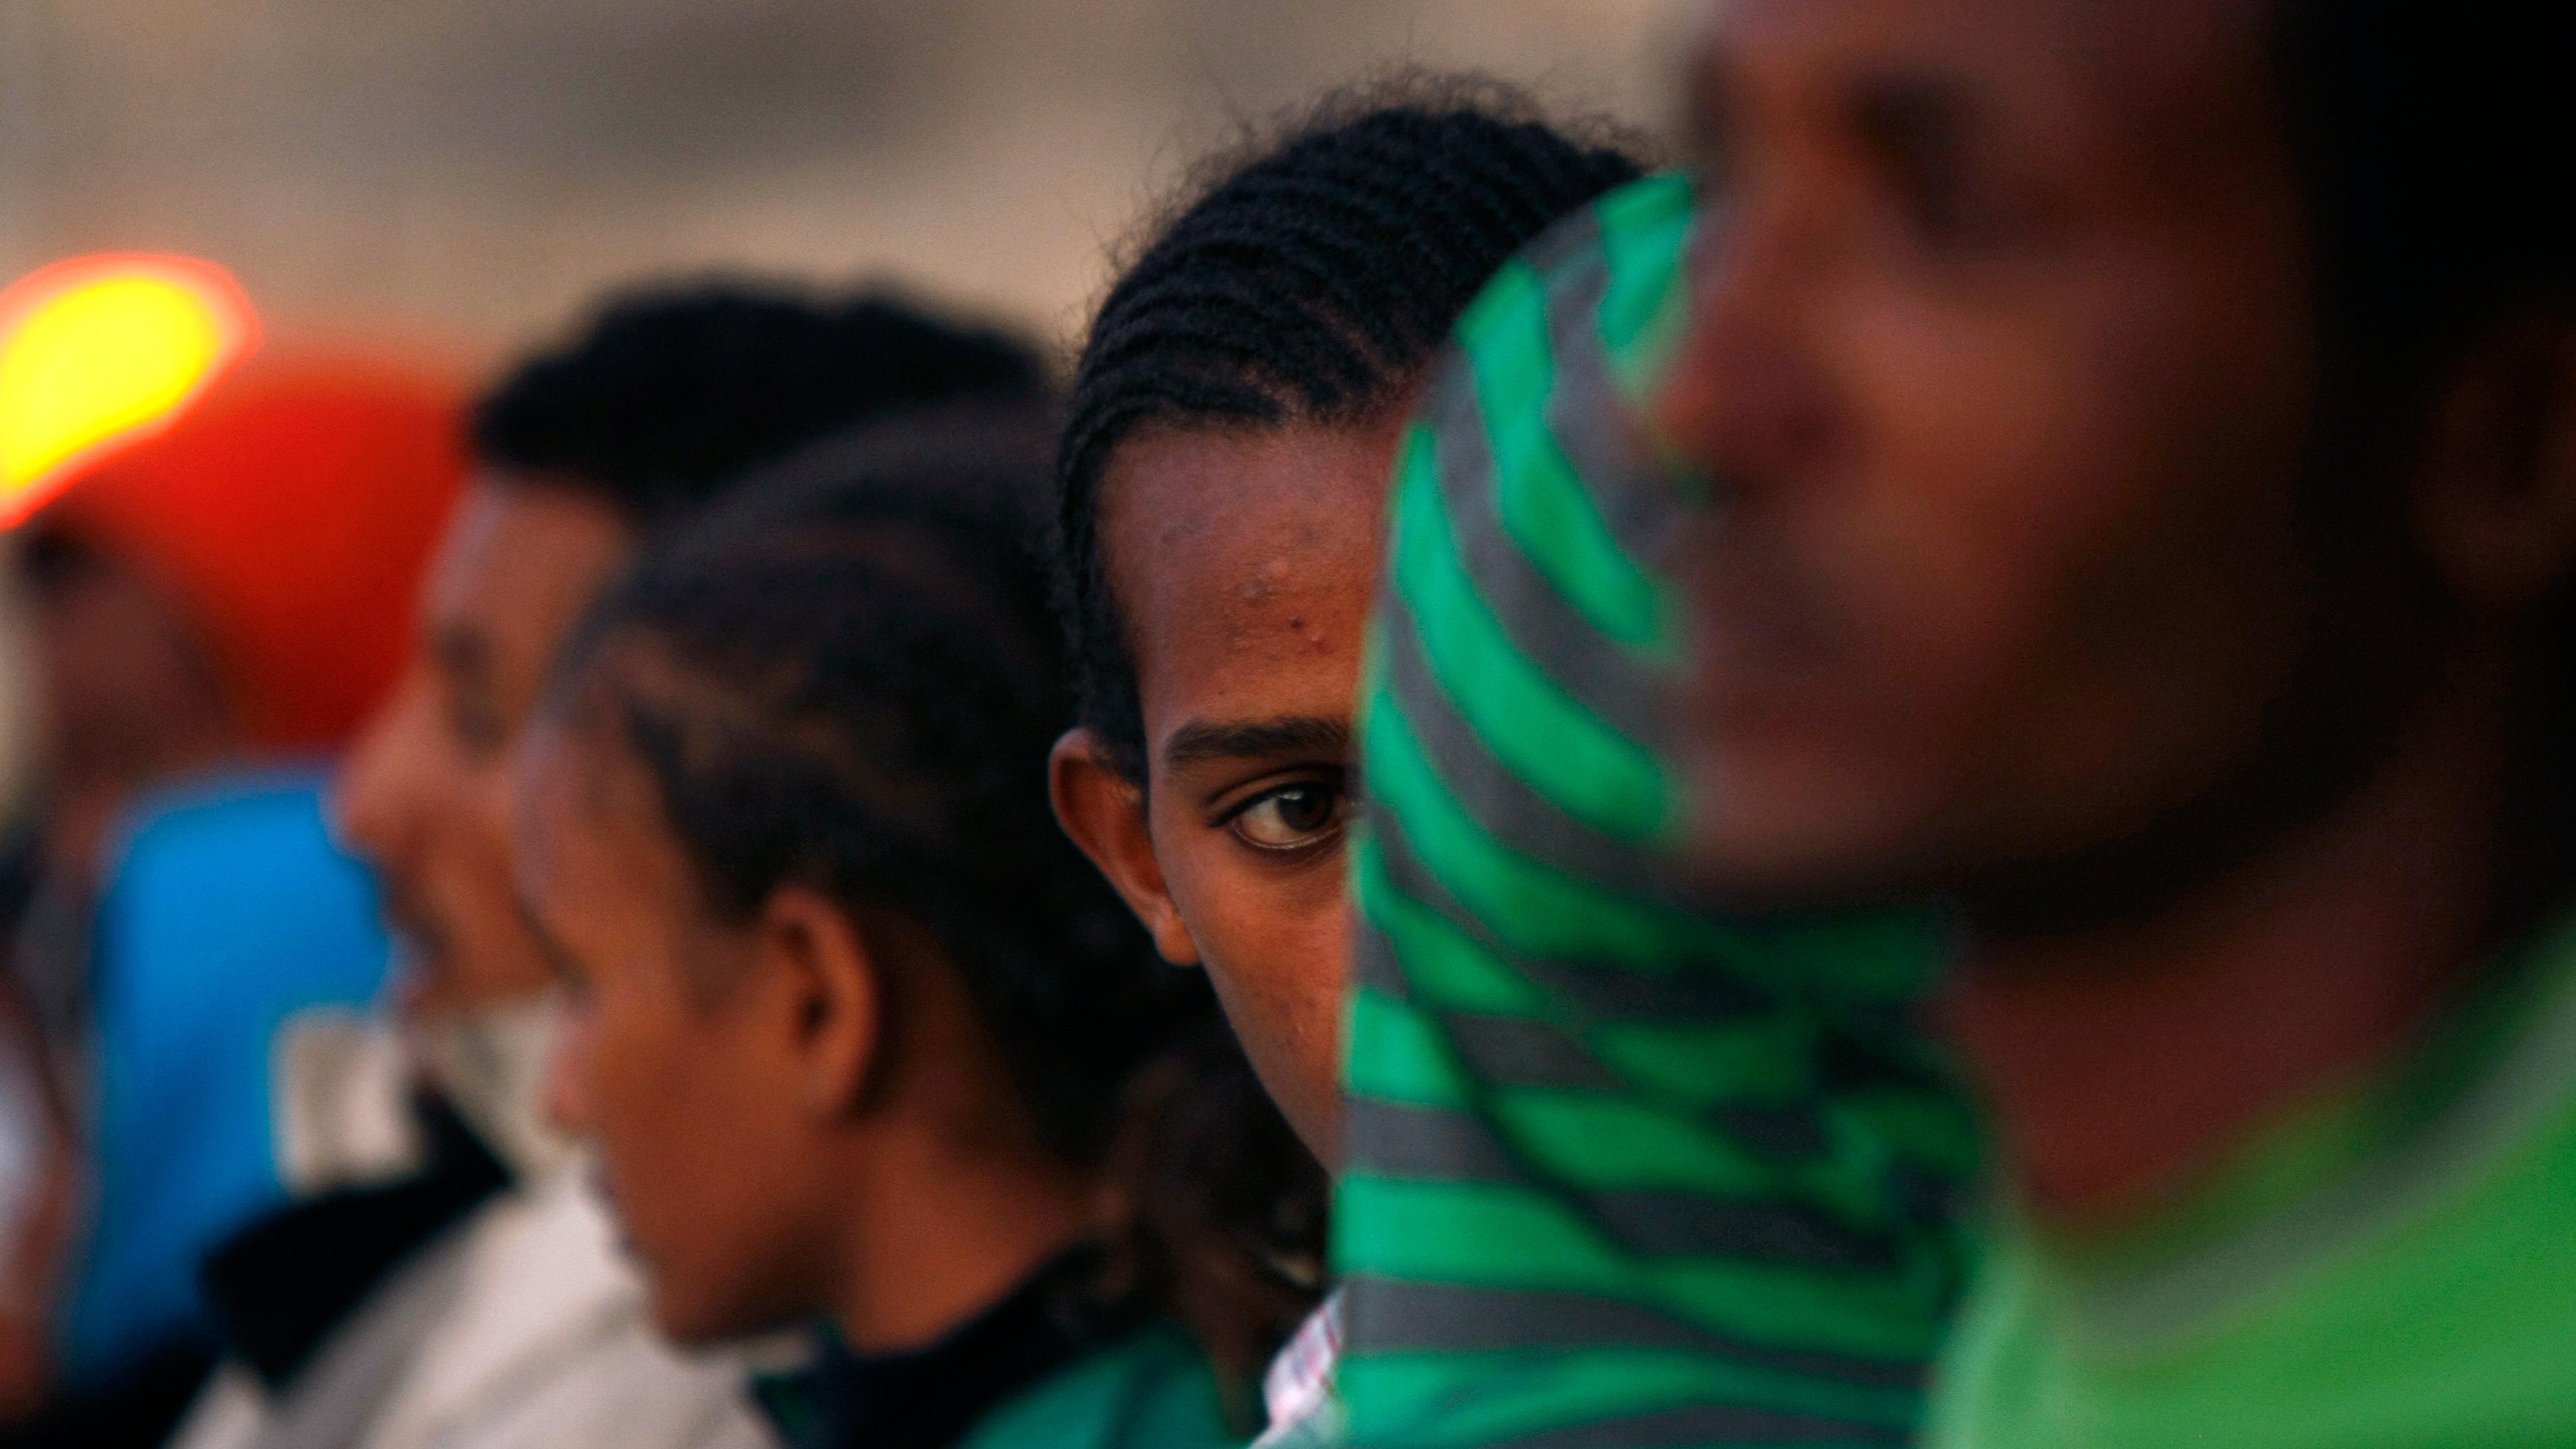 Eritreer Gemeinde in der Schweiz ist tief gespalten